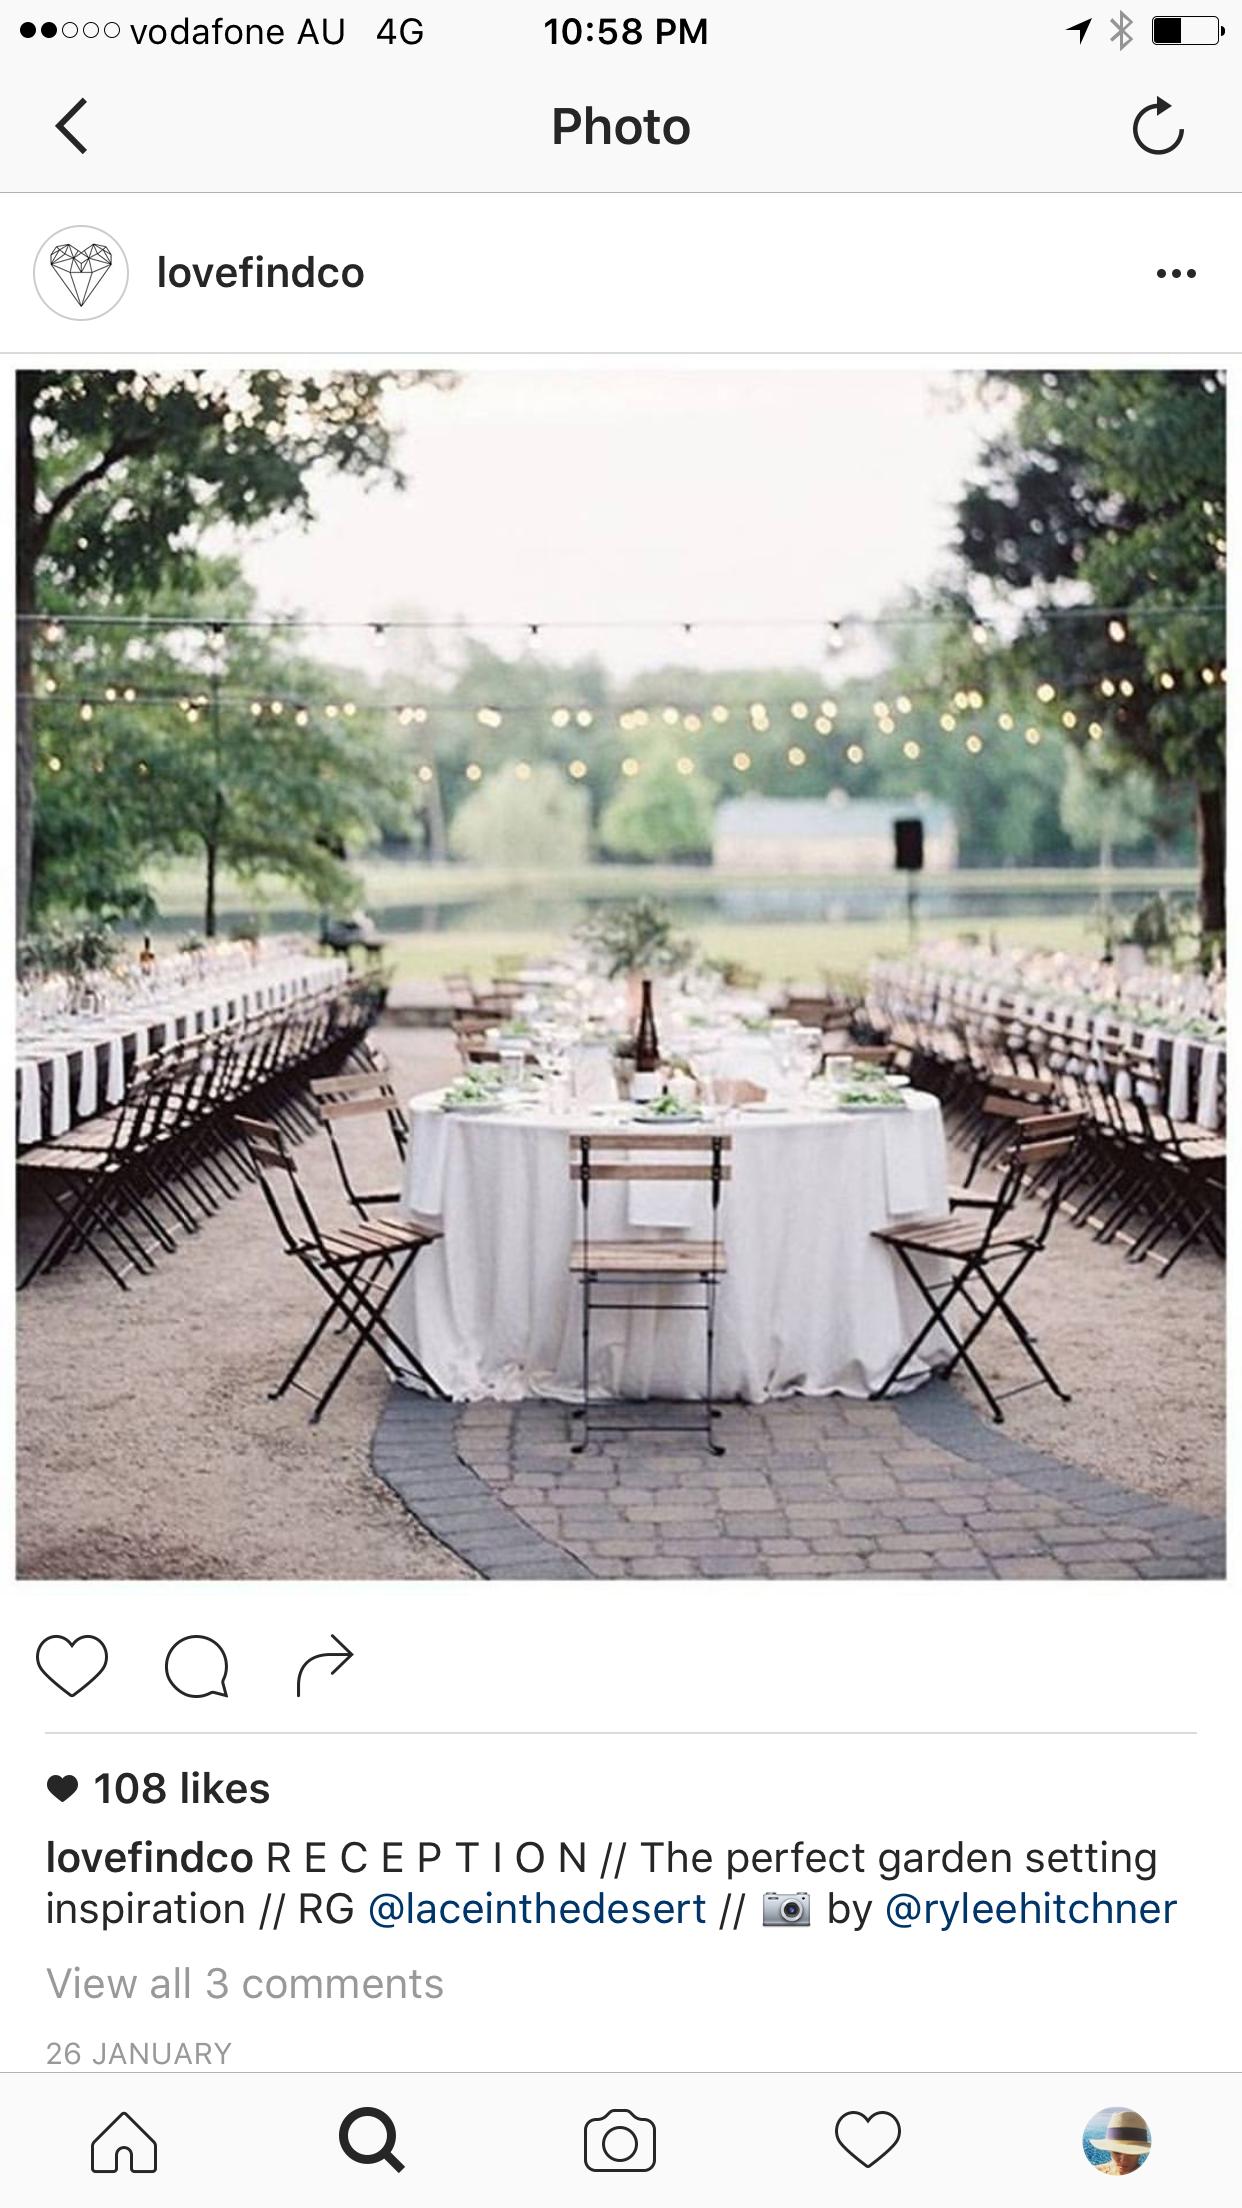 Pin by Julia Bills on Wedding ideas | Pinterest | Weddings